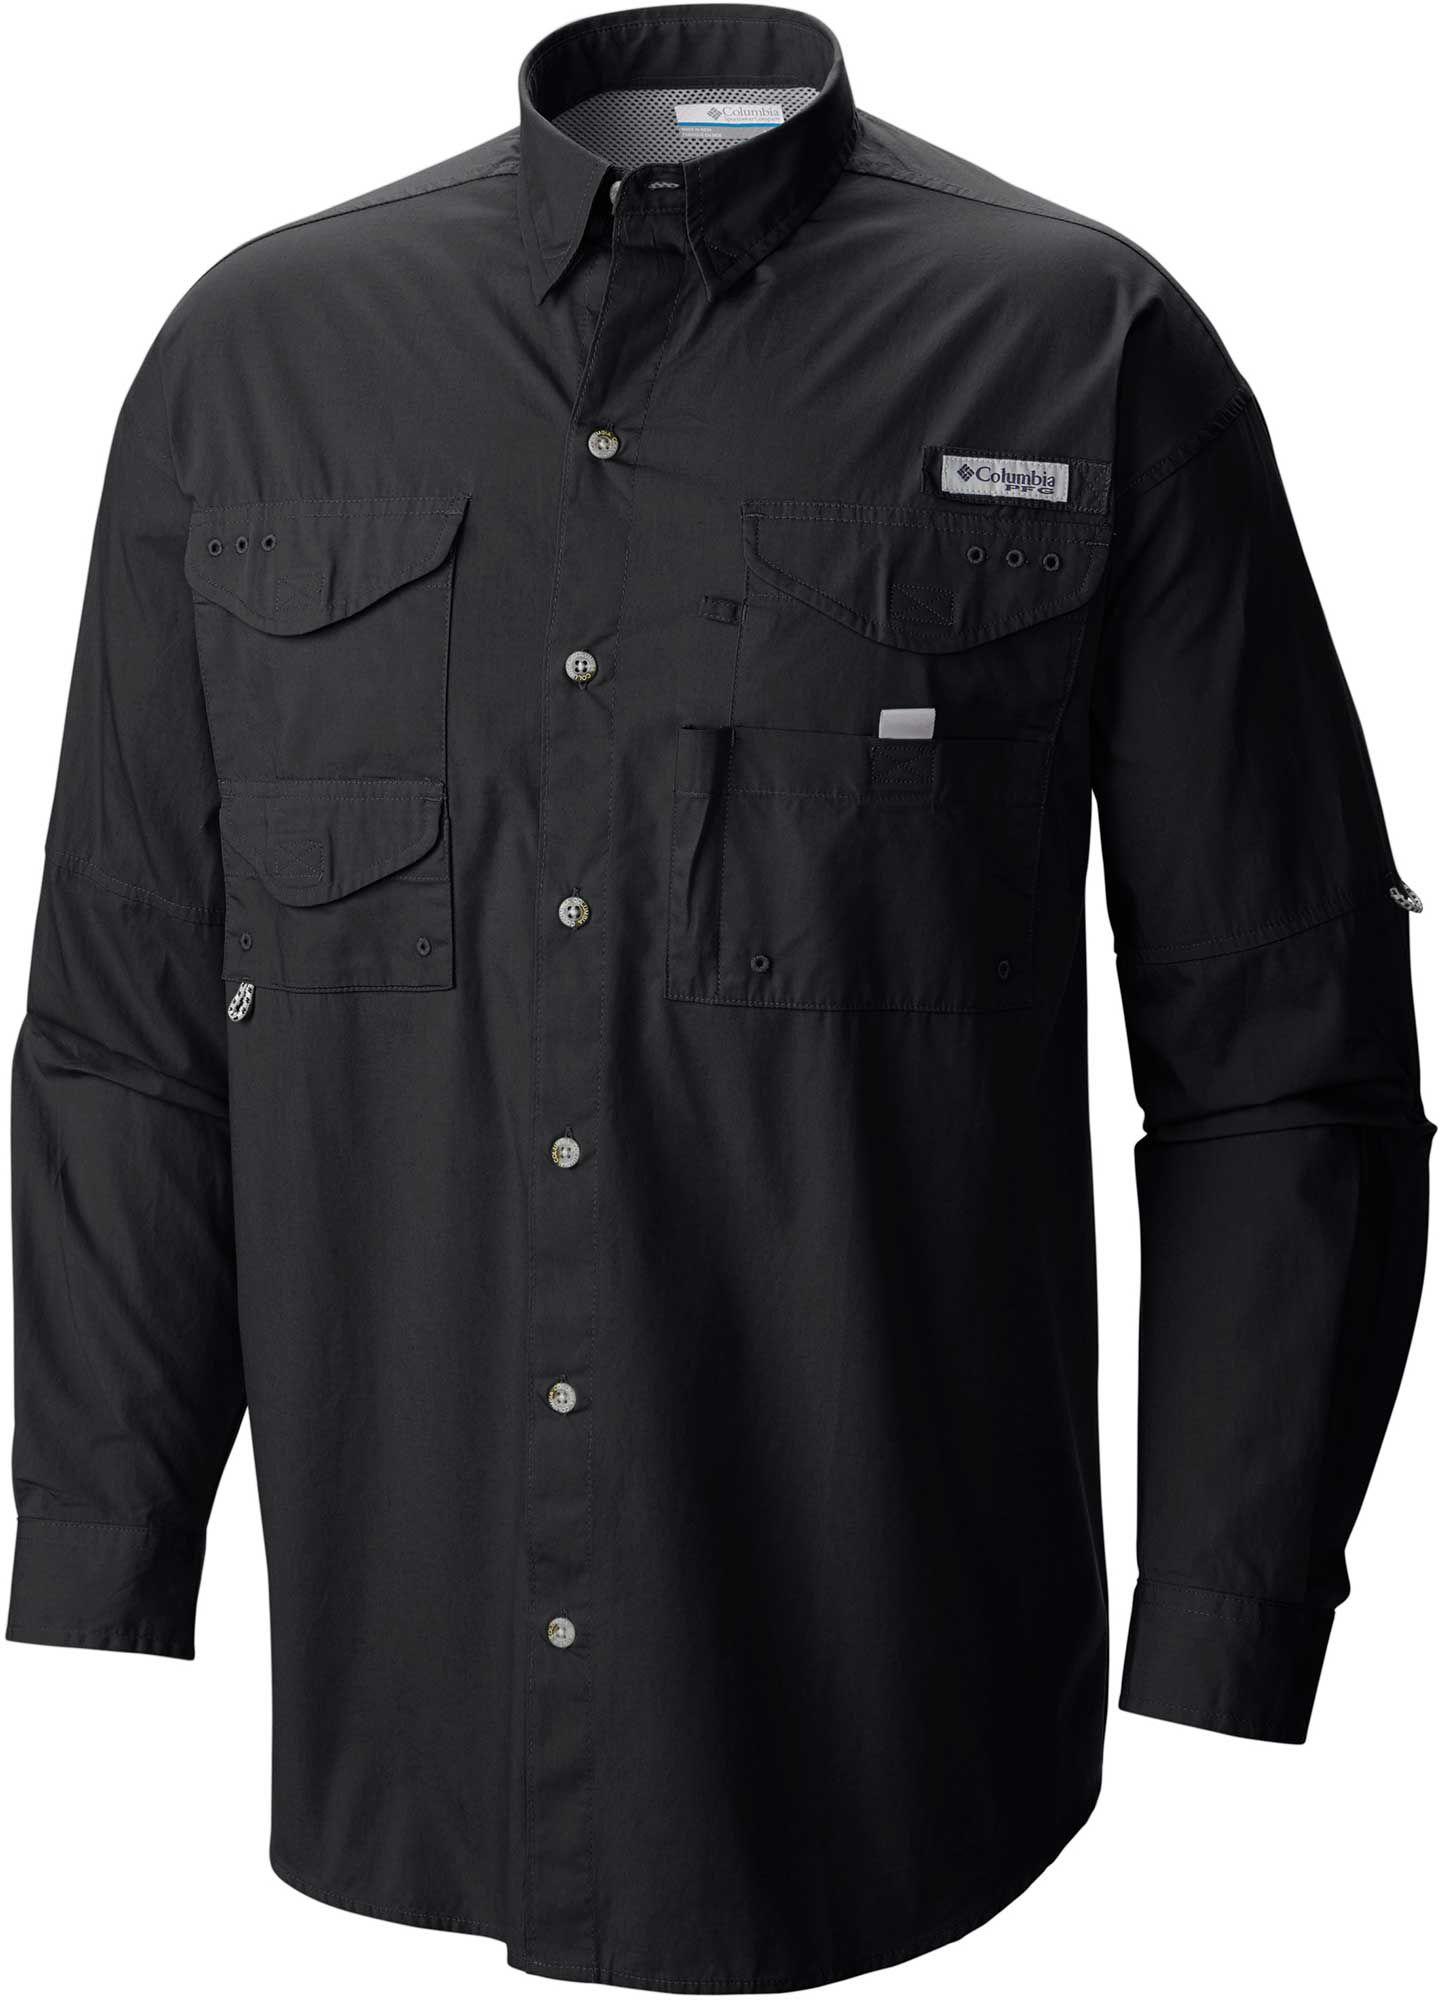 cadd8e44da7f4 Columbia Men's PFG Super Bonehead Classic Long Sleeve Fishing Shirt, Size:  LT, Black